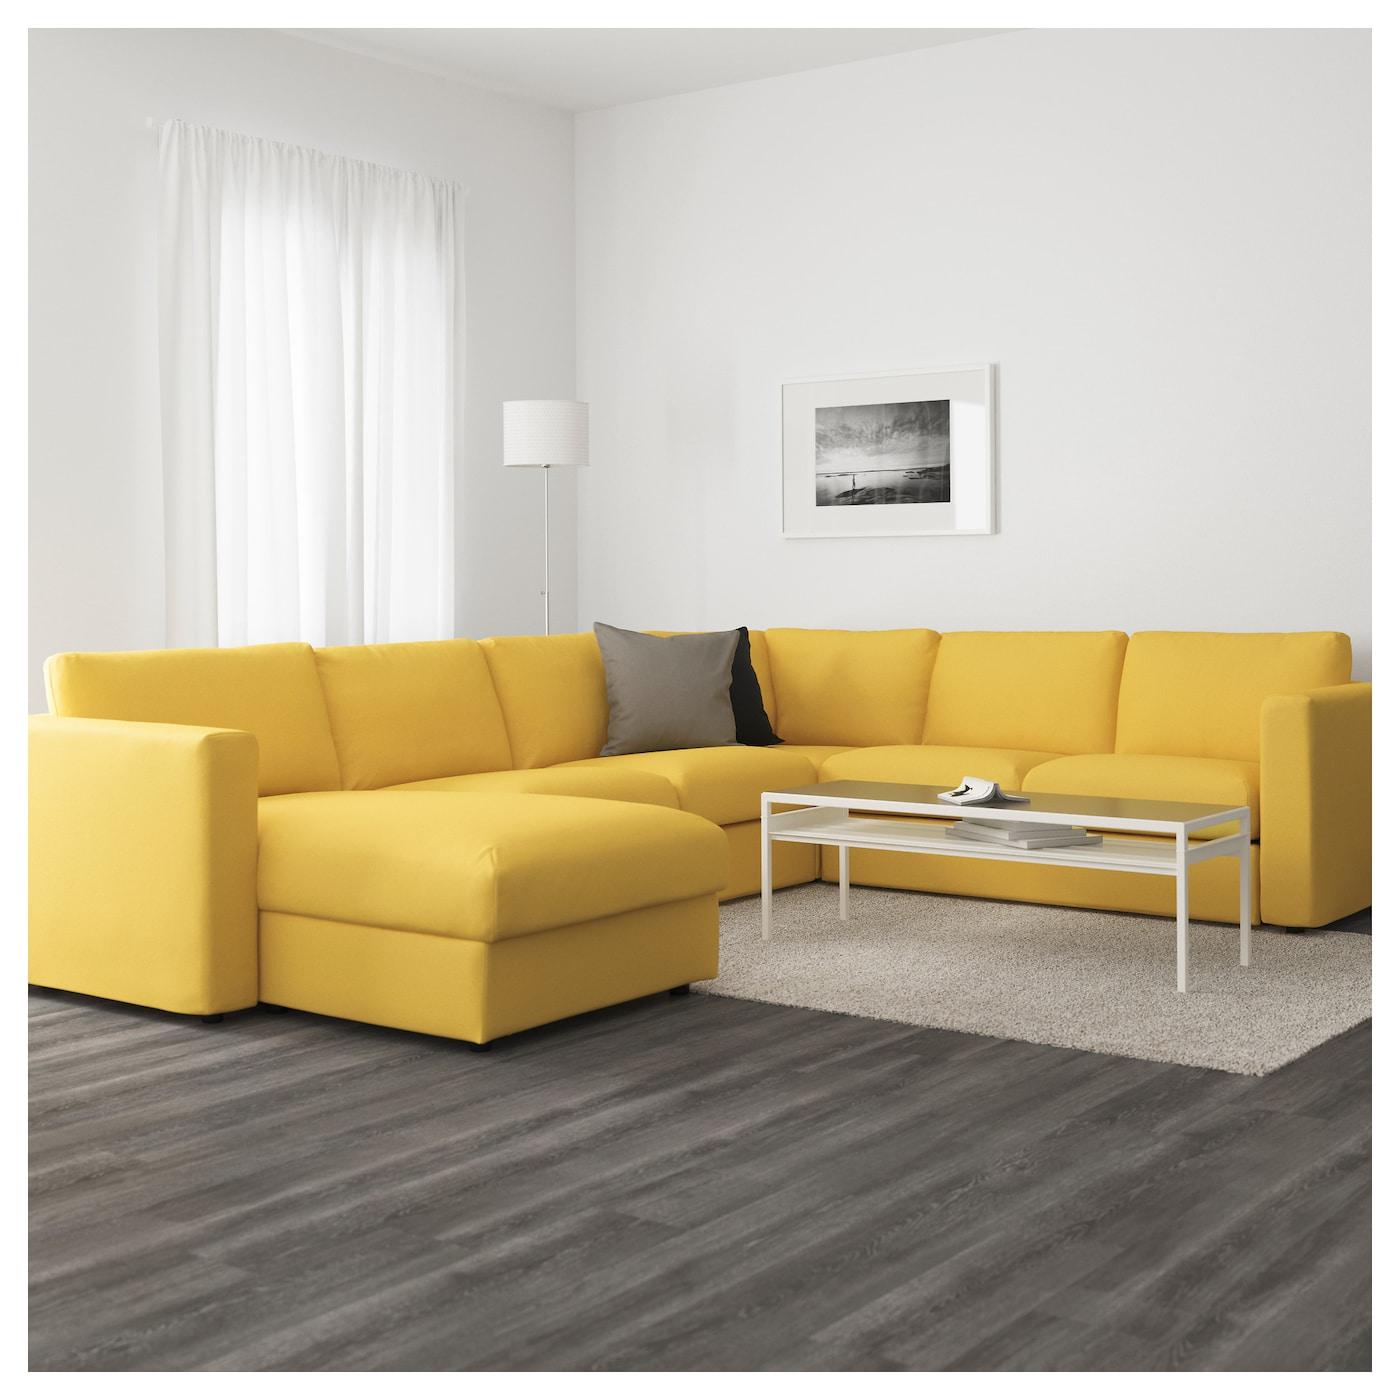 vimle canap d 39 angle 5 places avec m ridienne orrsta jaune dor ikea. Black Bedroom Furniture Sets. Home Design Ideas